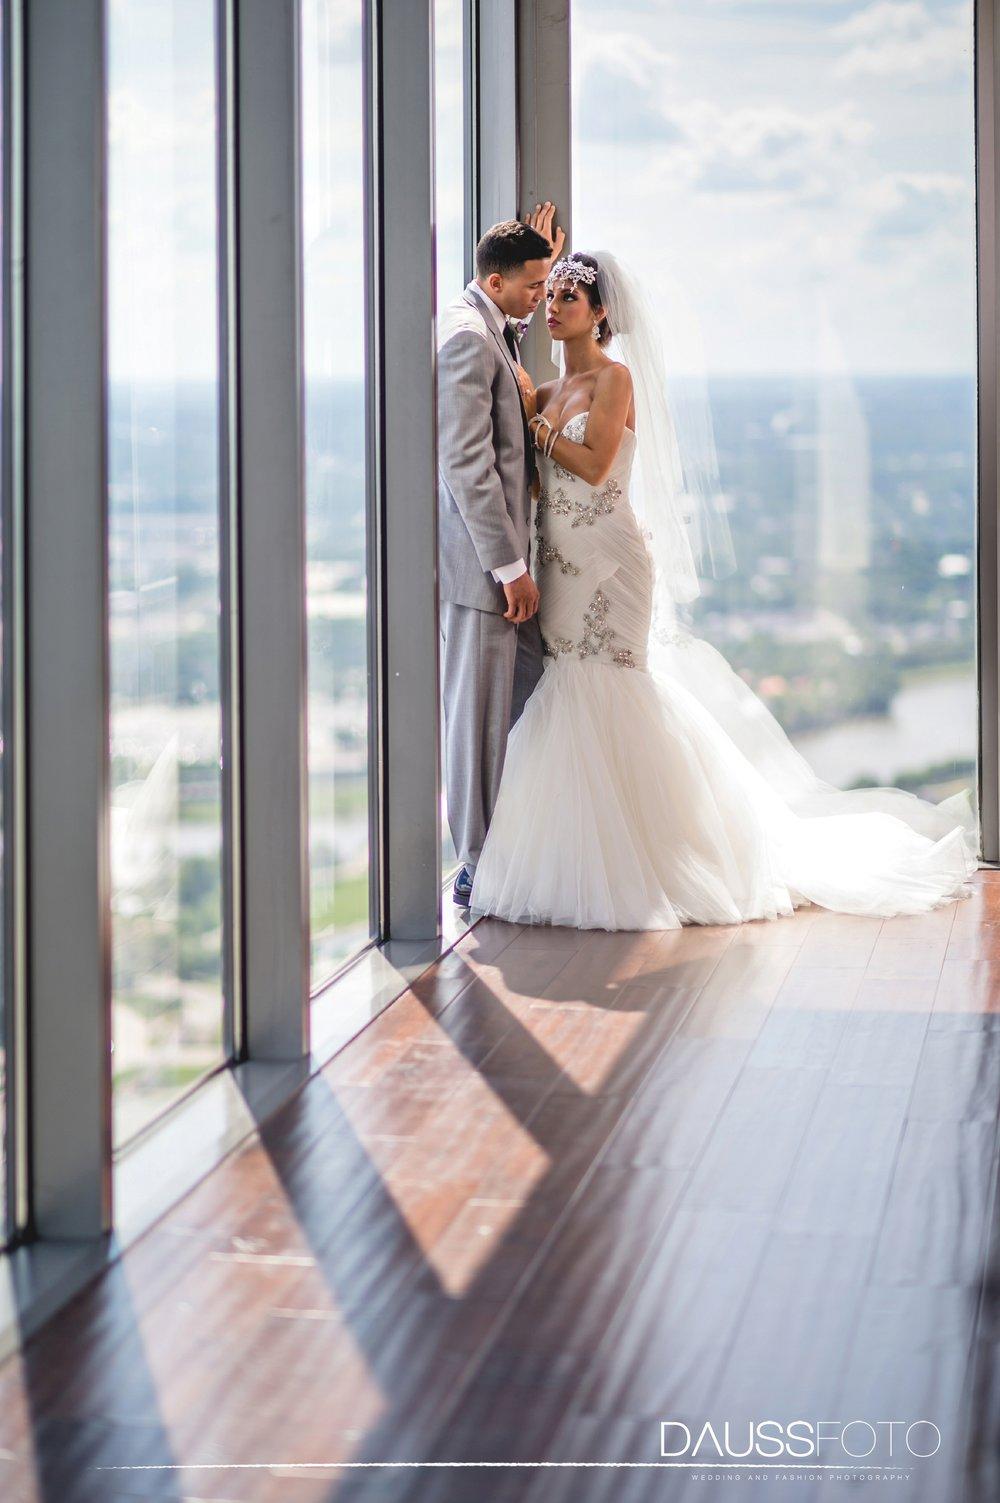 DaussFOTO_20150721_063_Indiana Wedding Photographer.jpg